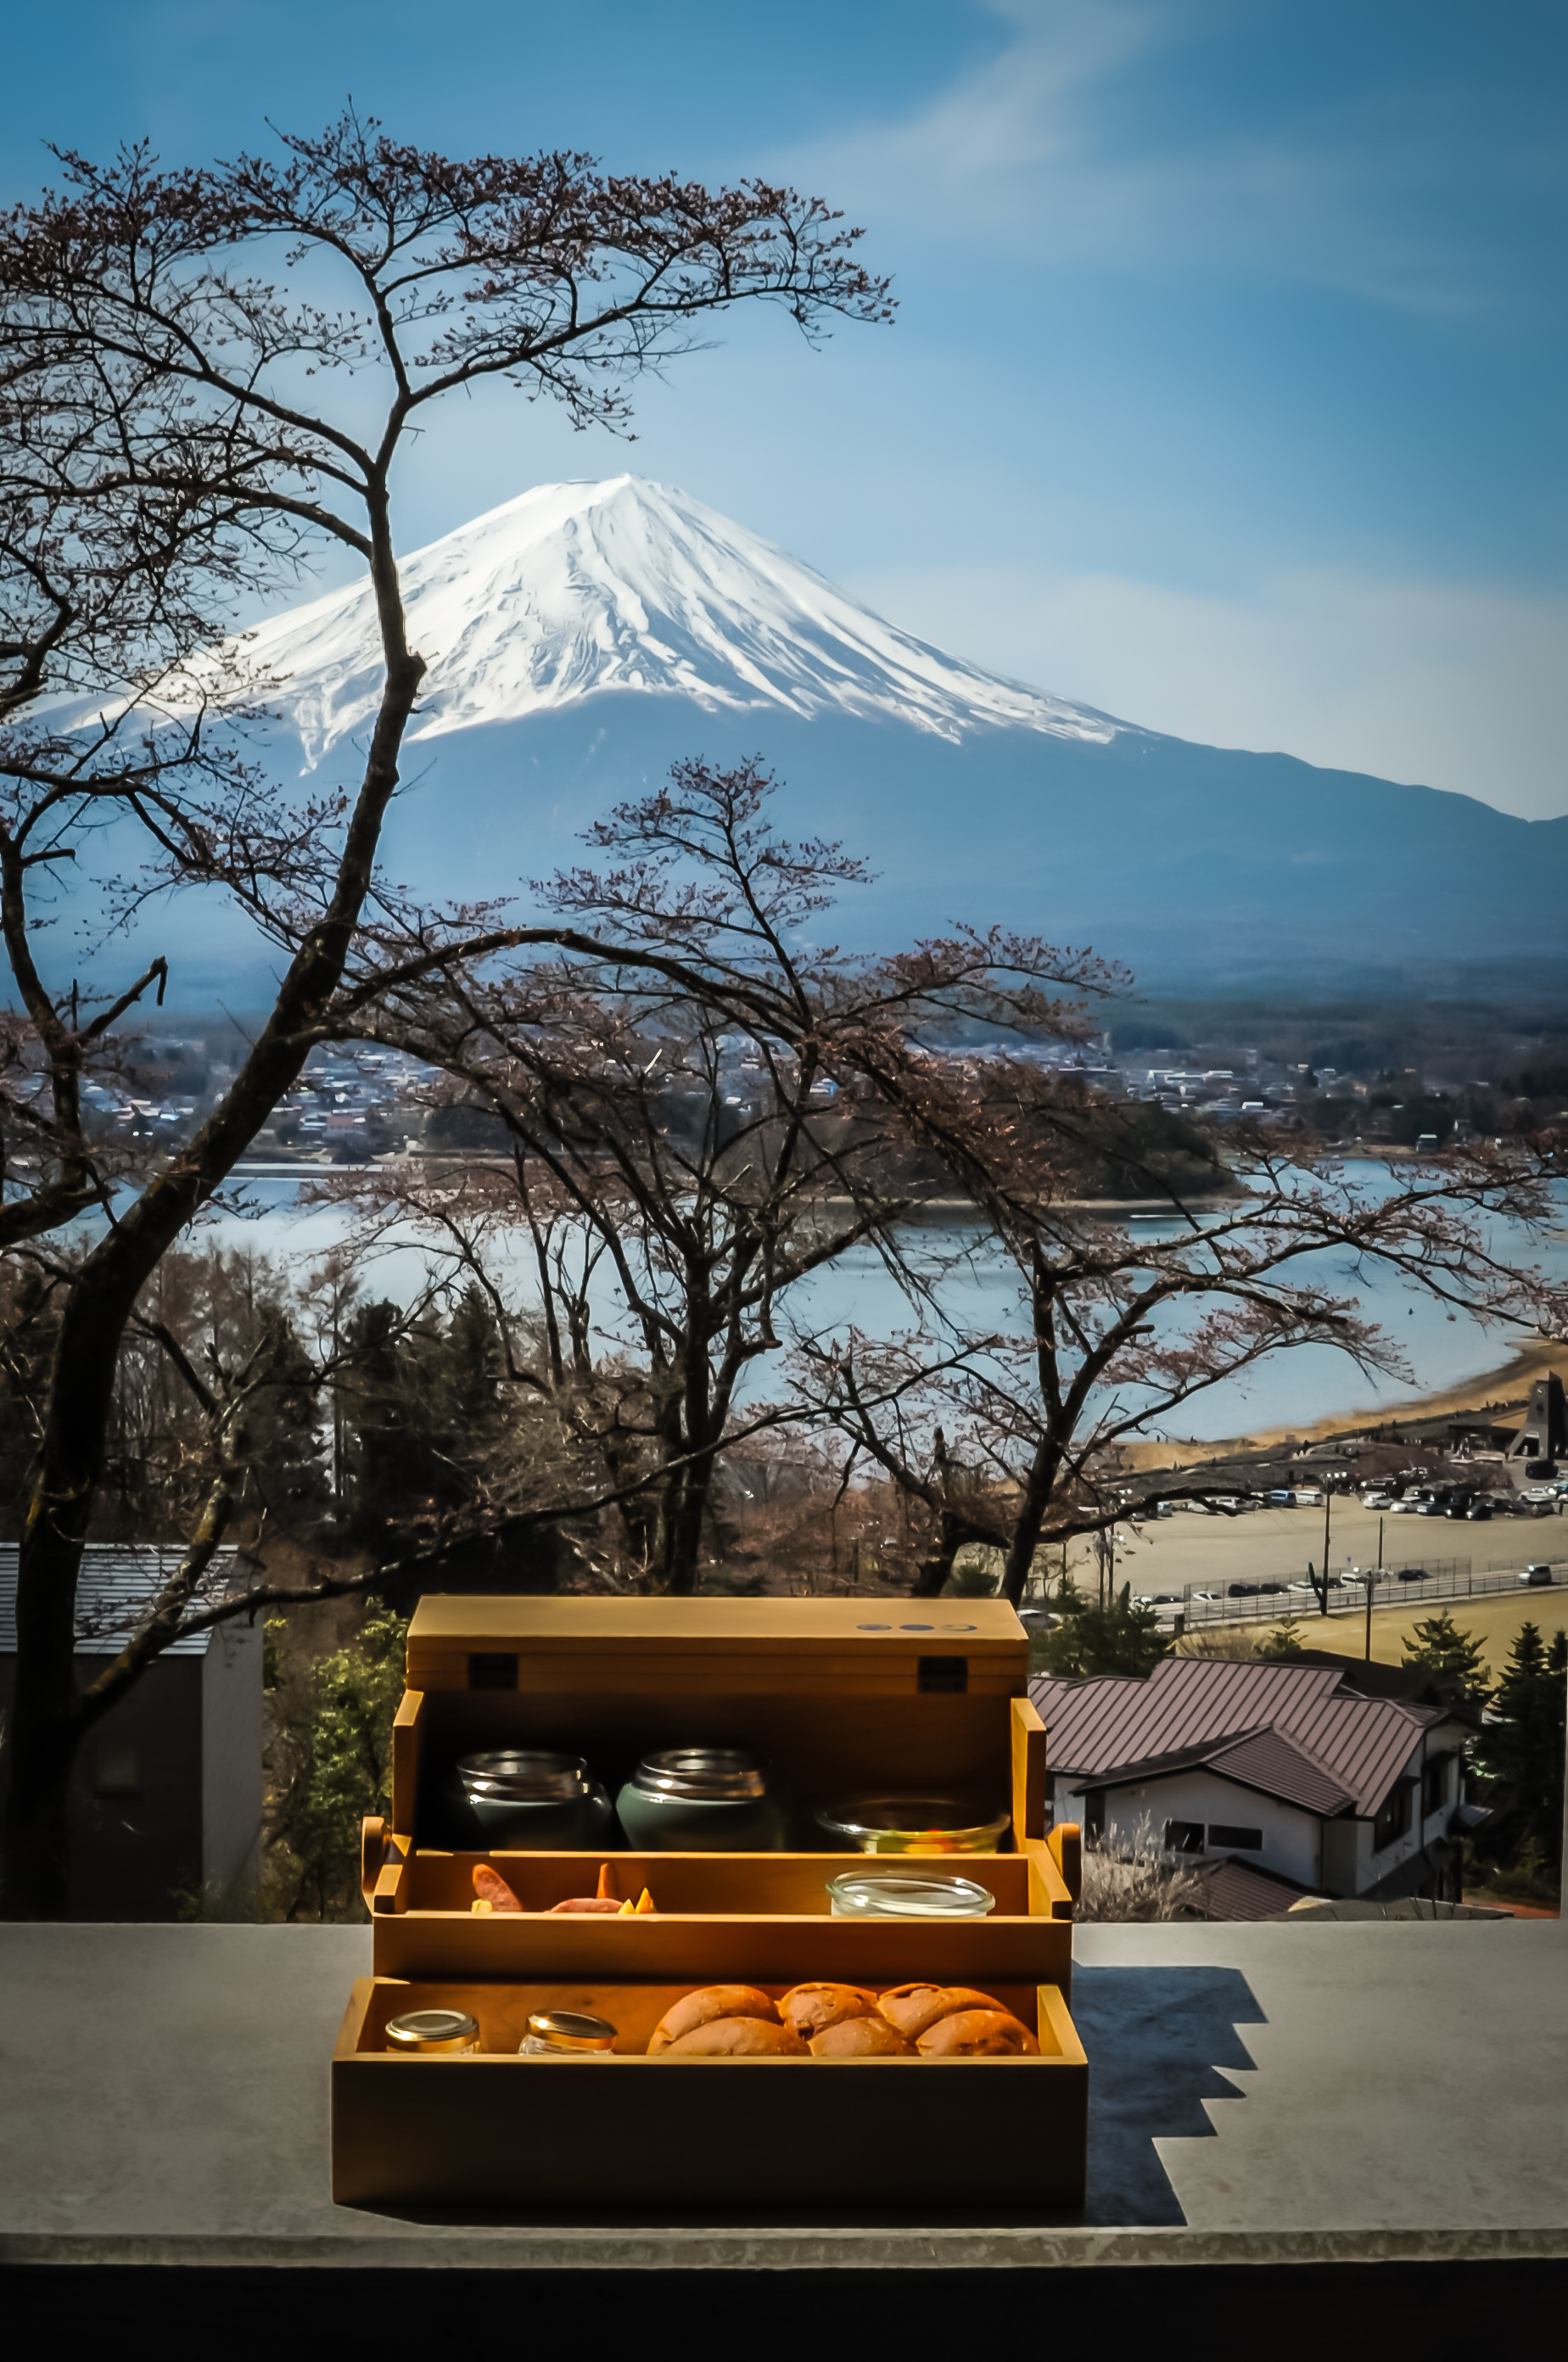 Hoshinoya Fuji (Fujikawaguchiko)